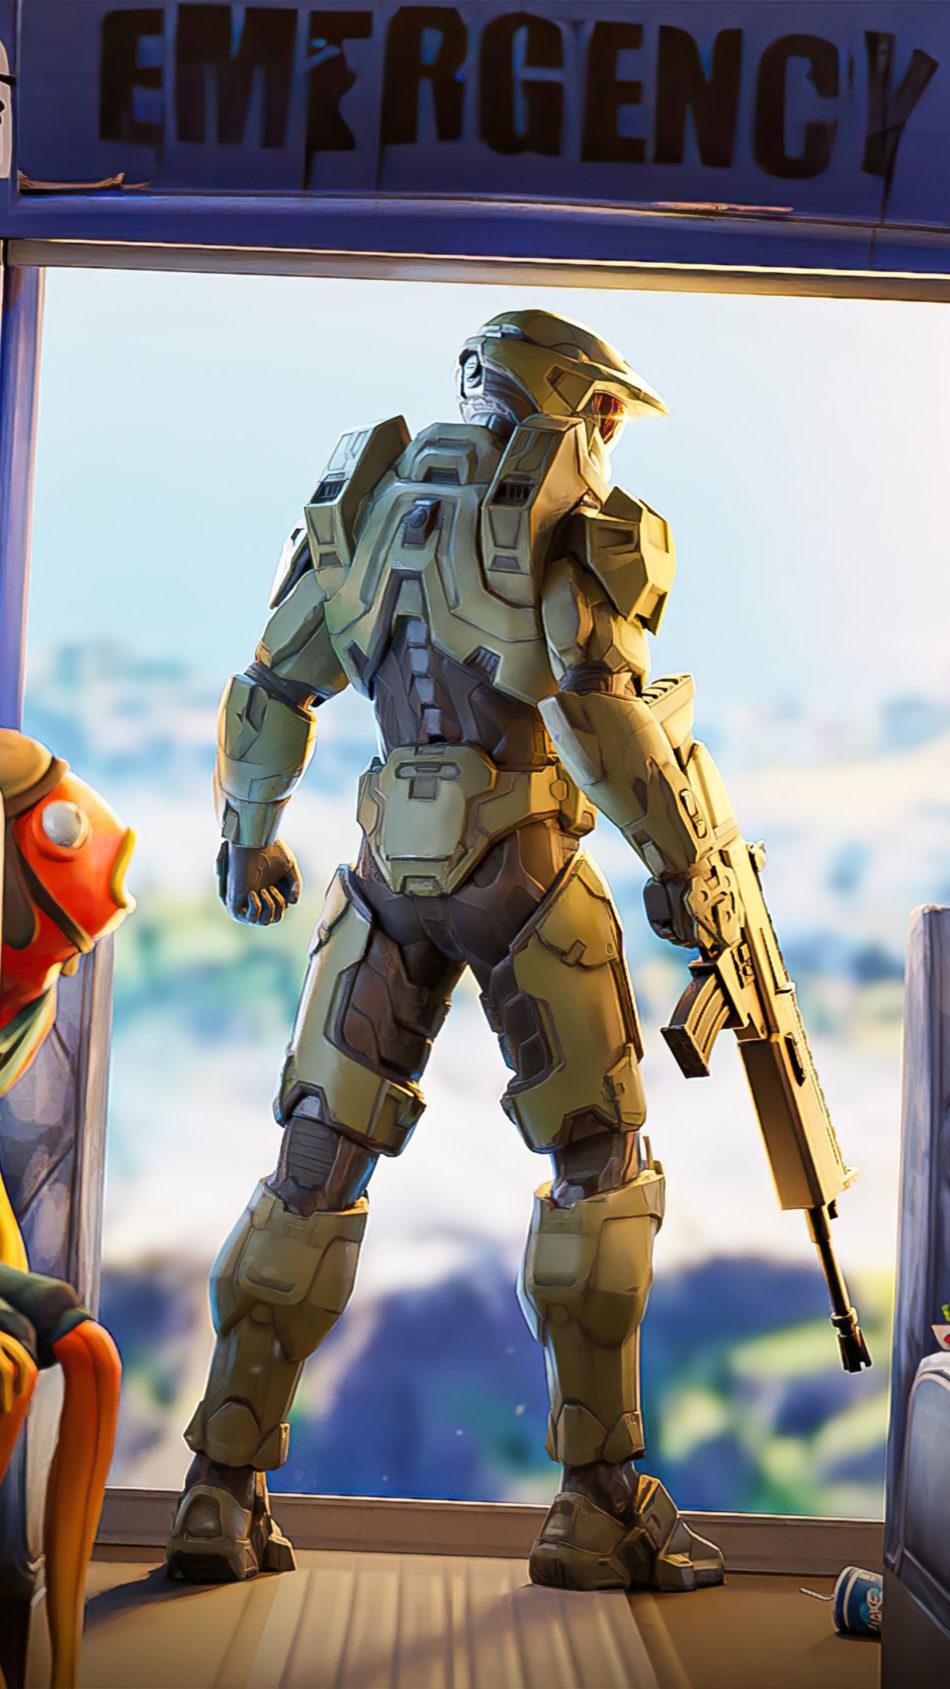 Halo Chief In Fortnite 4K Ultra HD Mobile Wallpaper